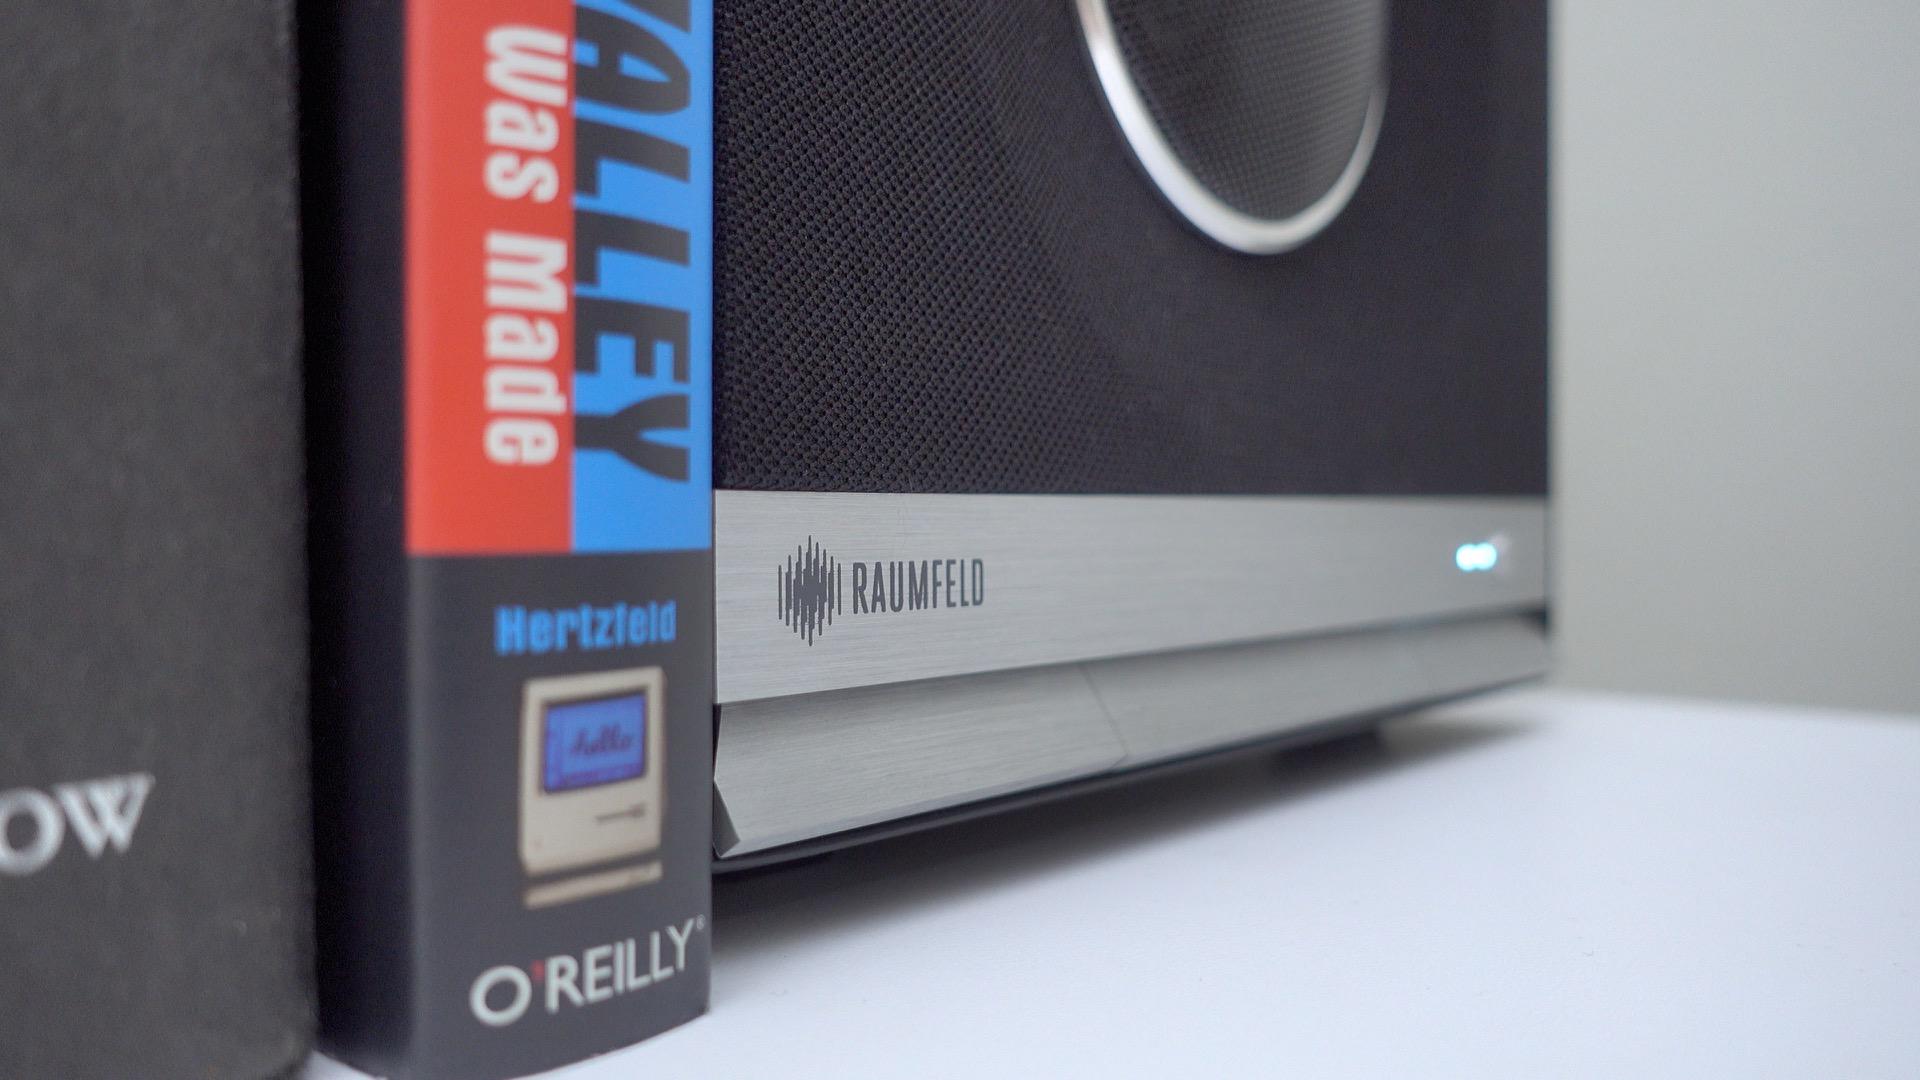 raumfeld-stereo-cubes-speakers